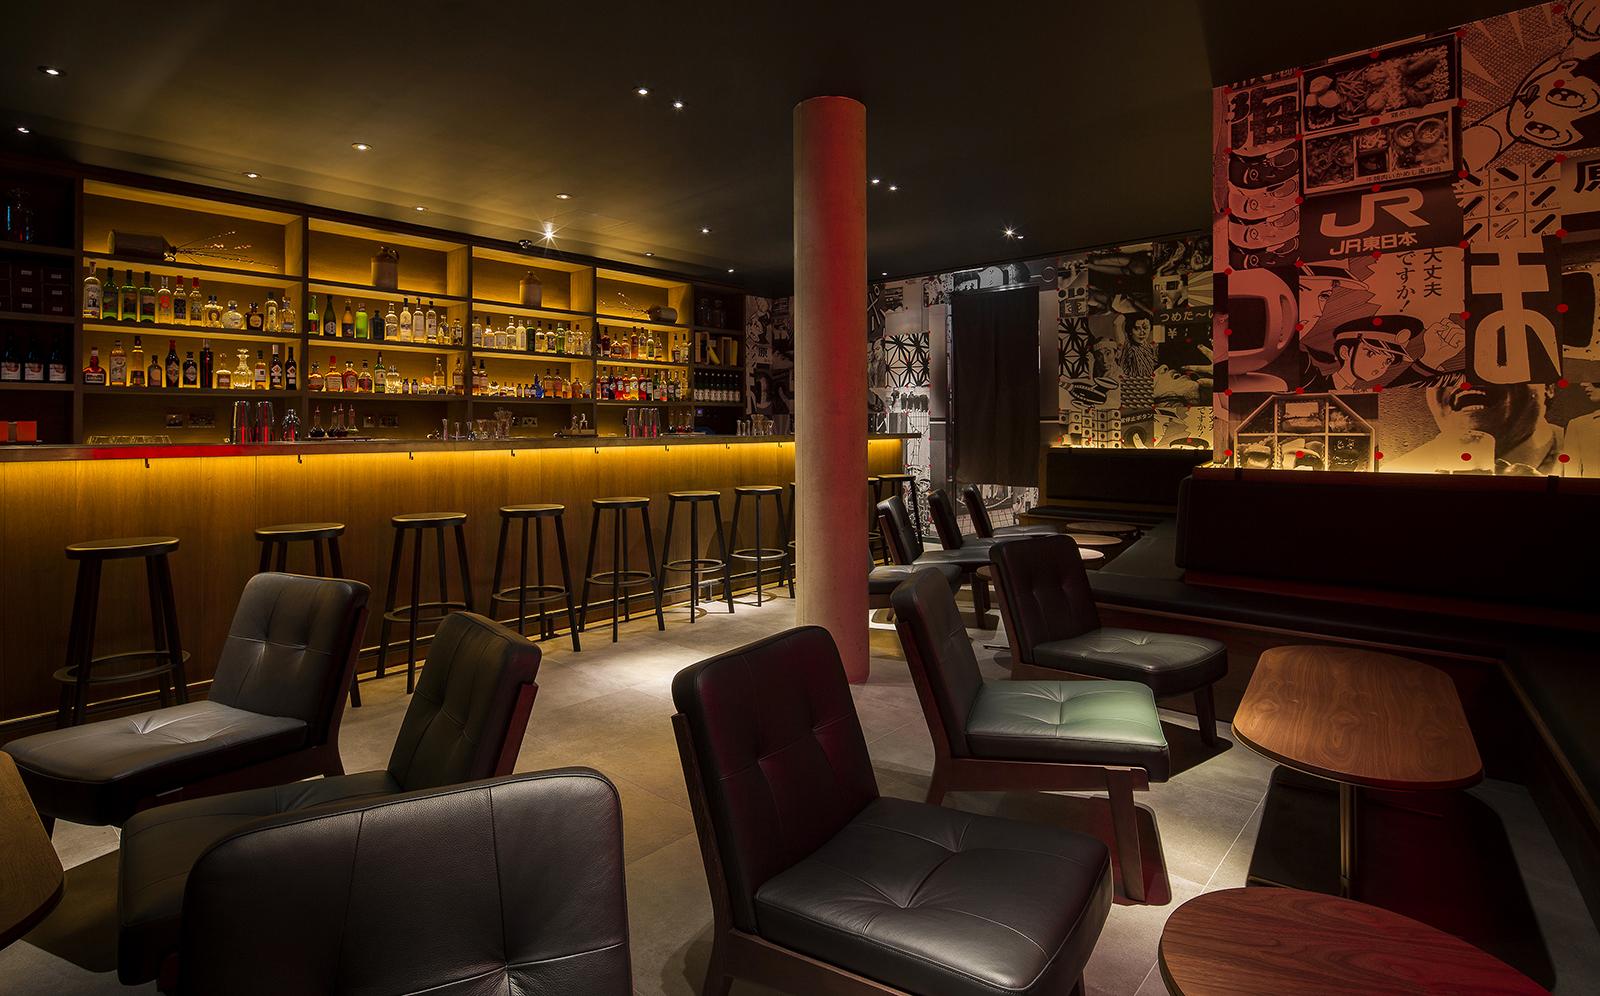 Jason Atherton's Sosharu restaurant designed by Neri & Hu